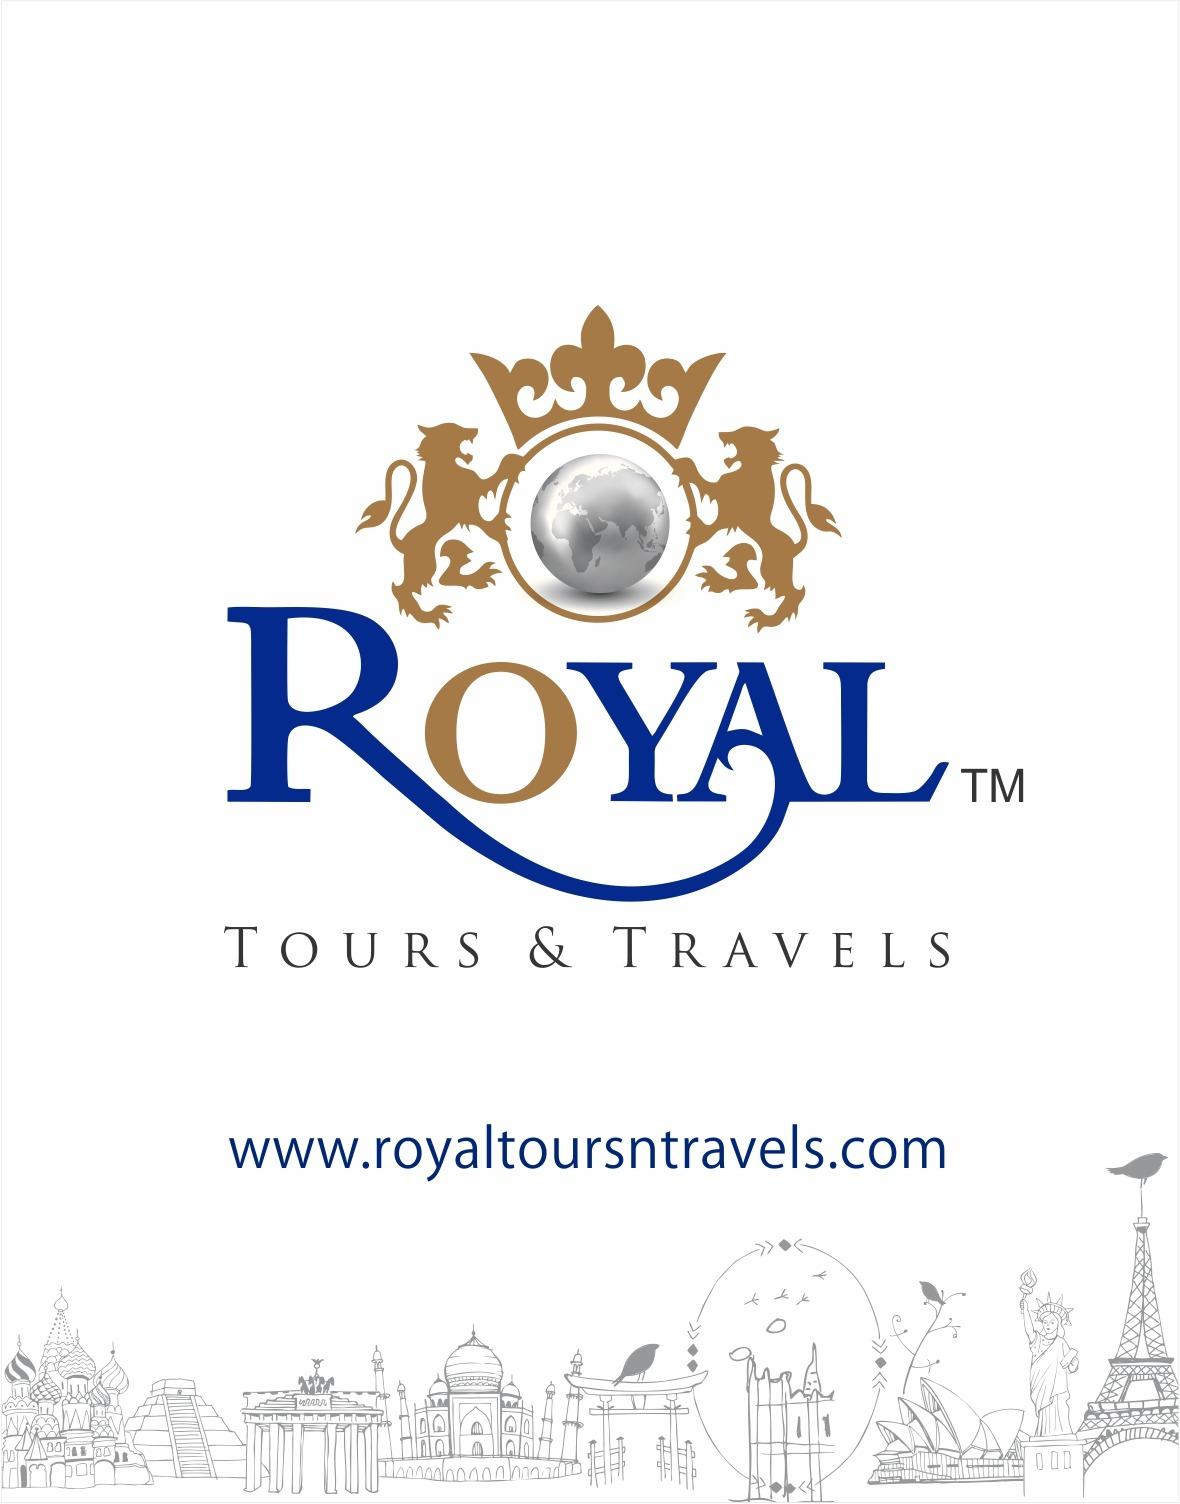 Royal Tours & Travels Rajkot